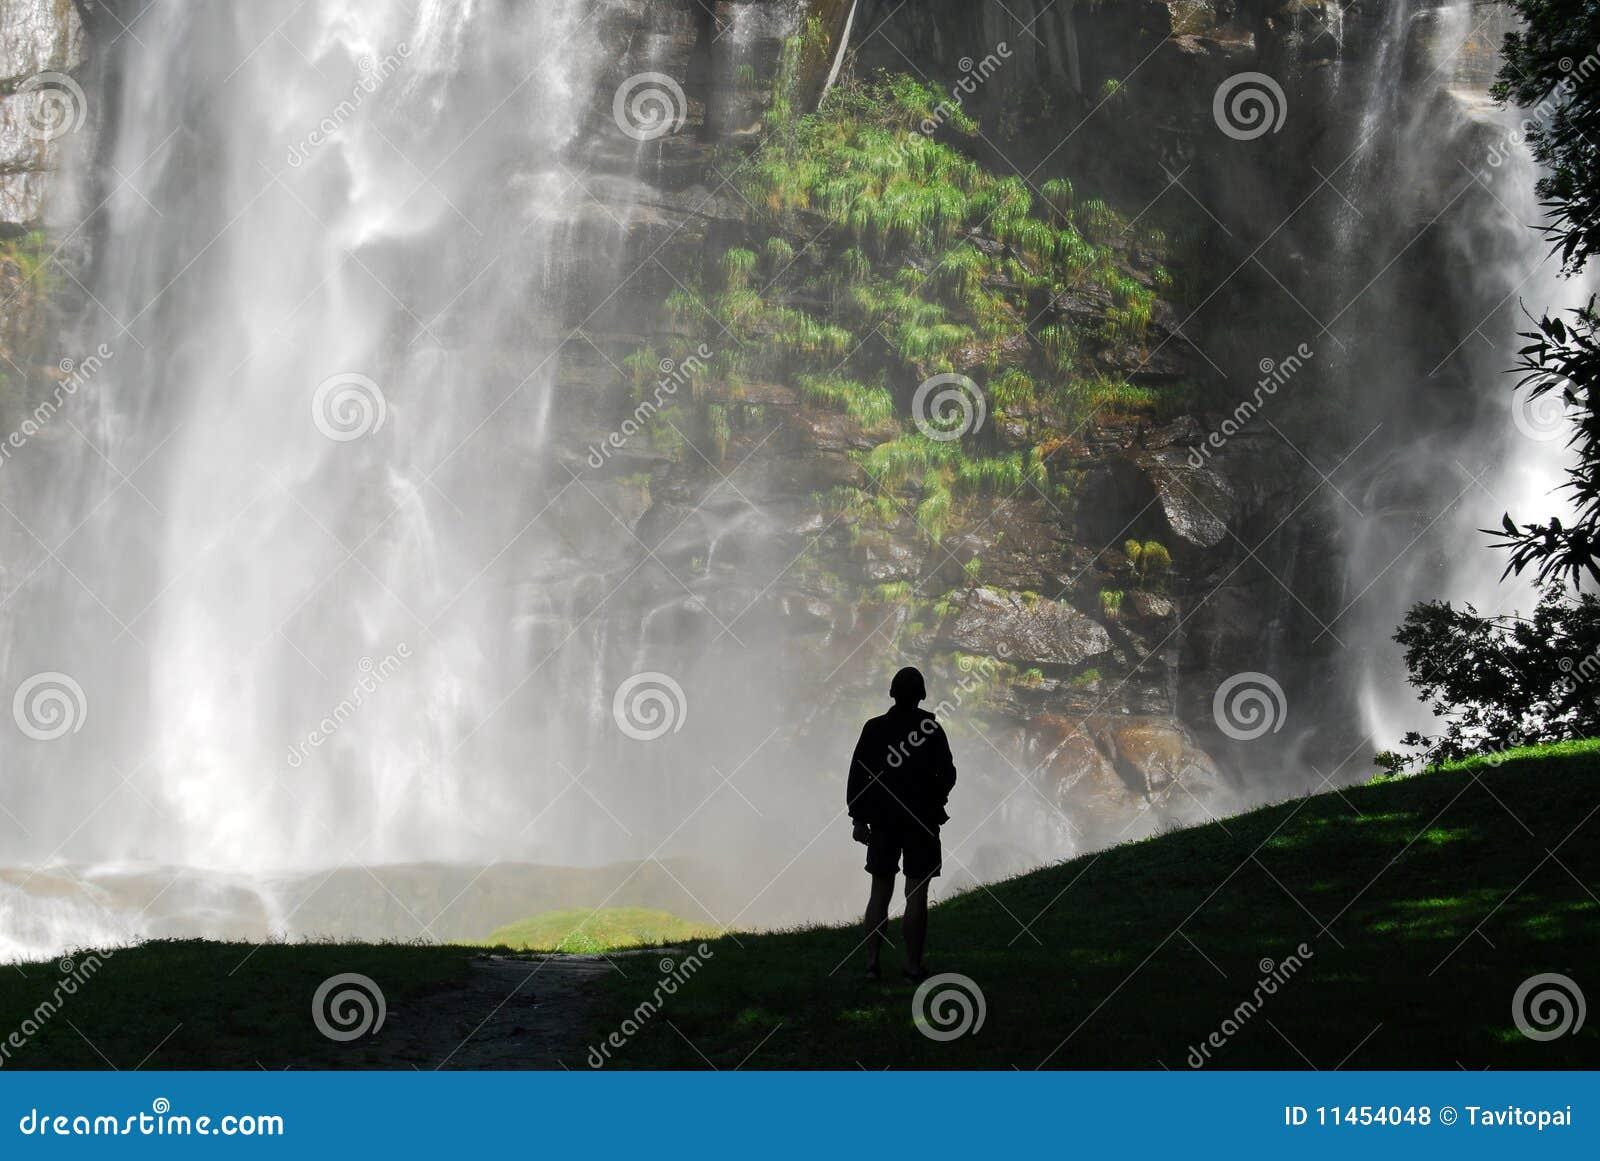 Cascata Astonishing